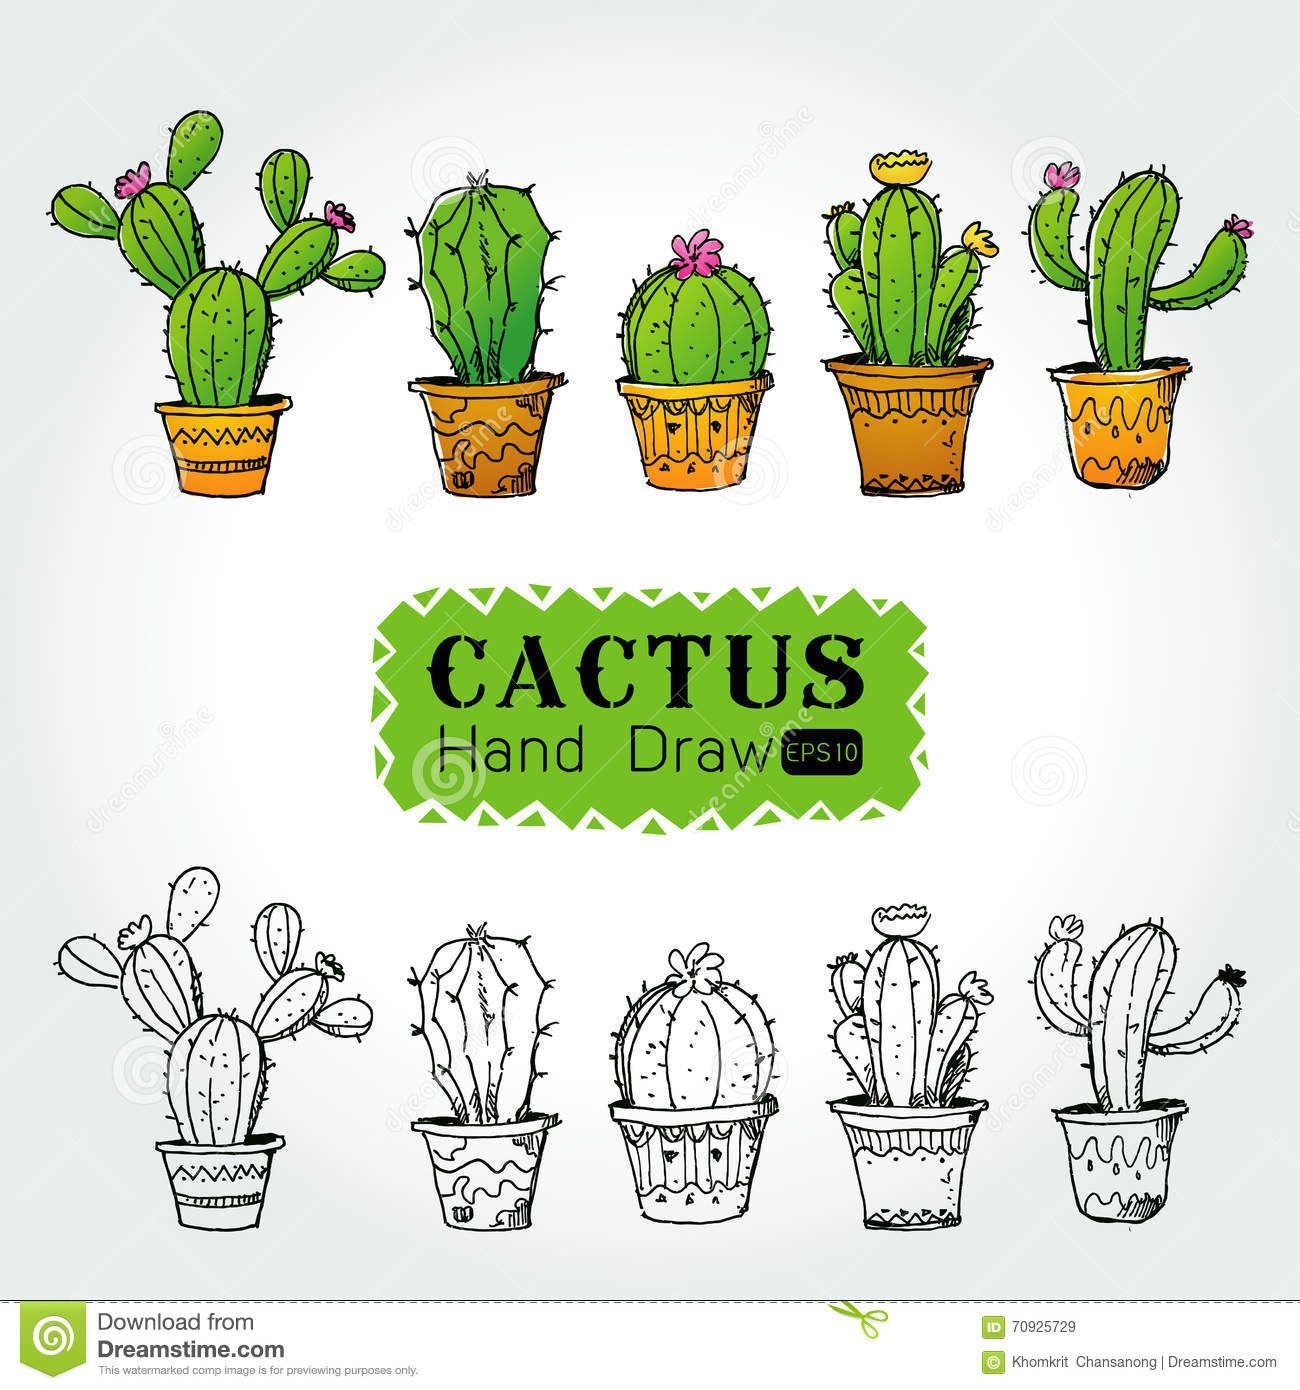 cactus dibujo - Buscar con Google | Cactus ideas | Pinterest ...